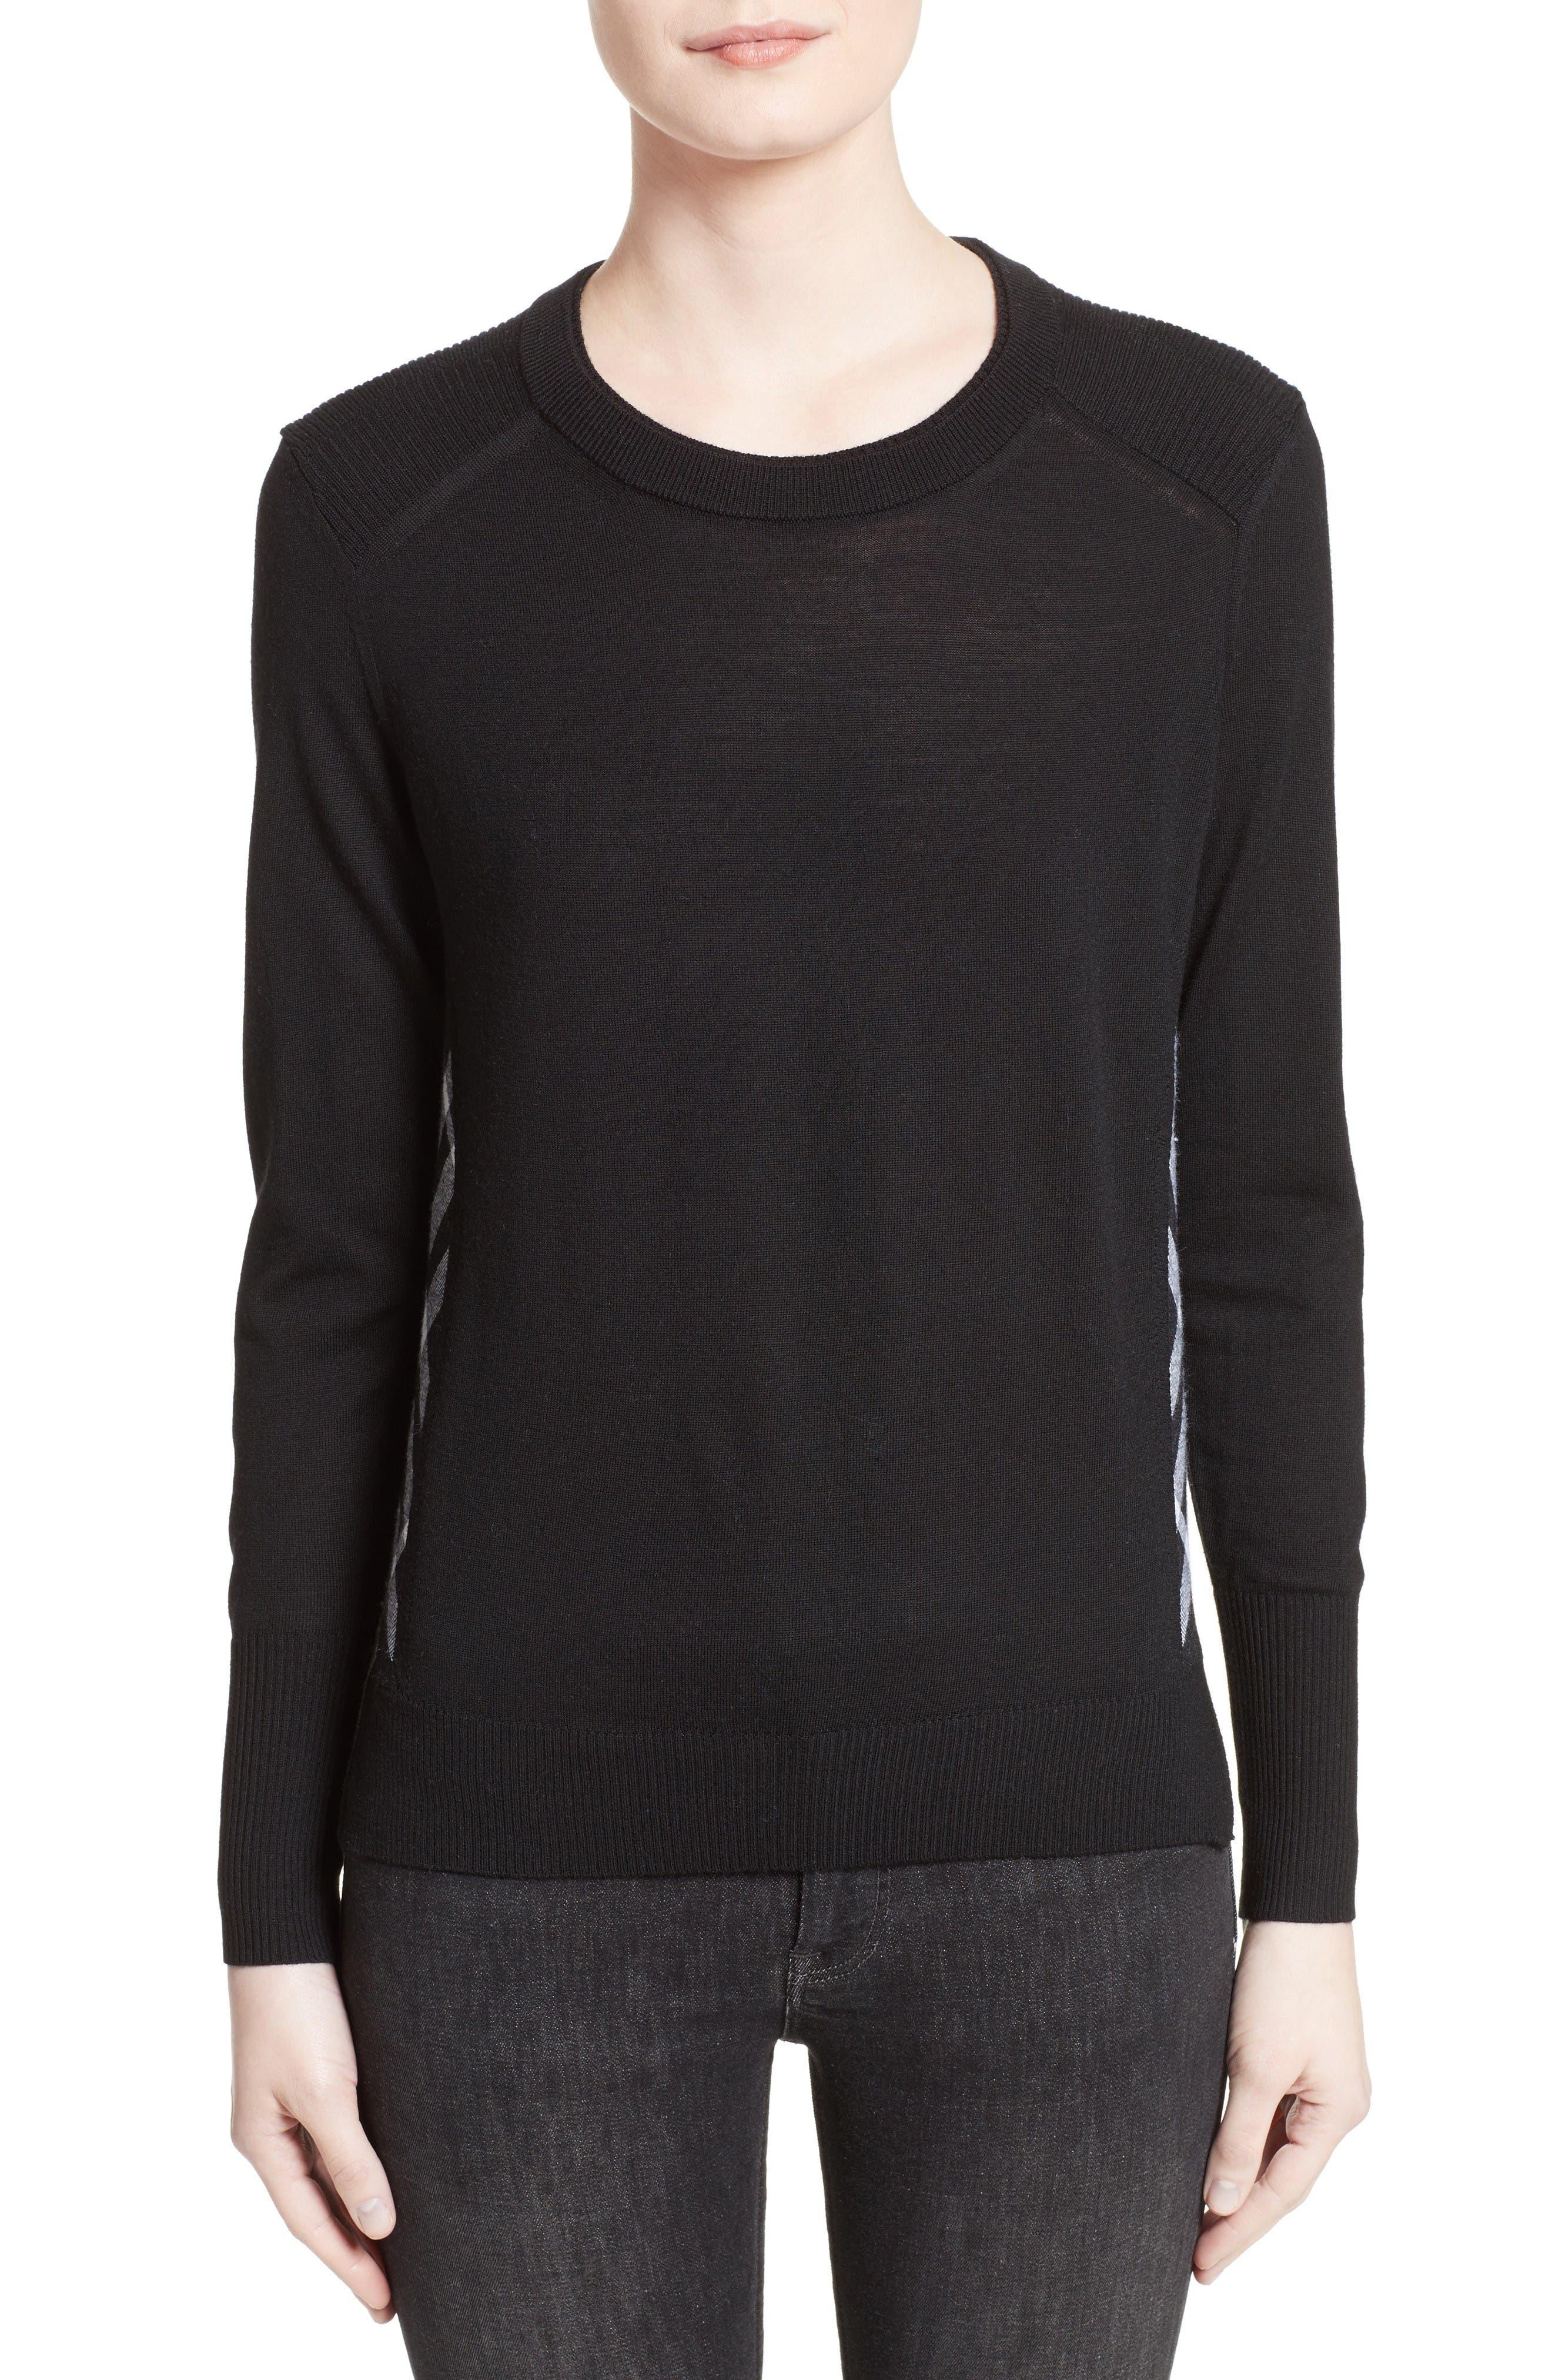 Meigan Merino Wool Sweater,                         Main,                         color, Black